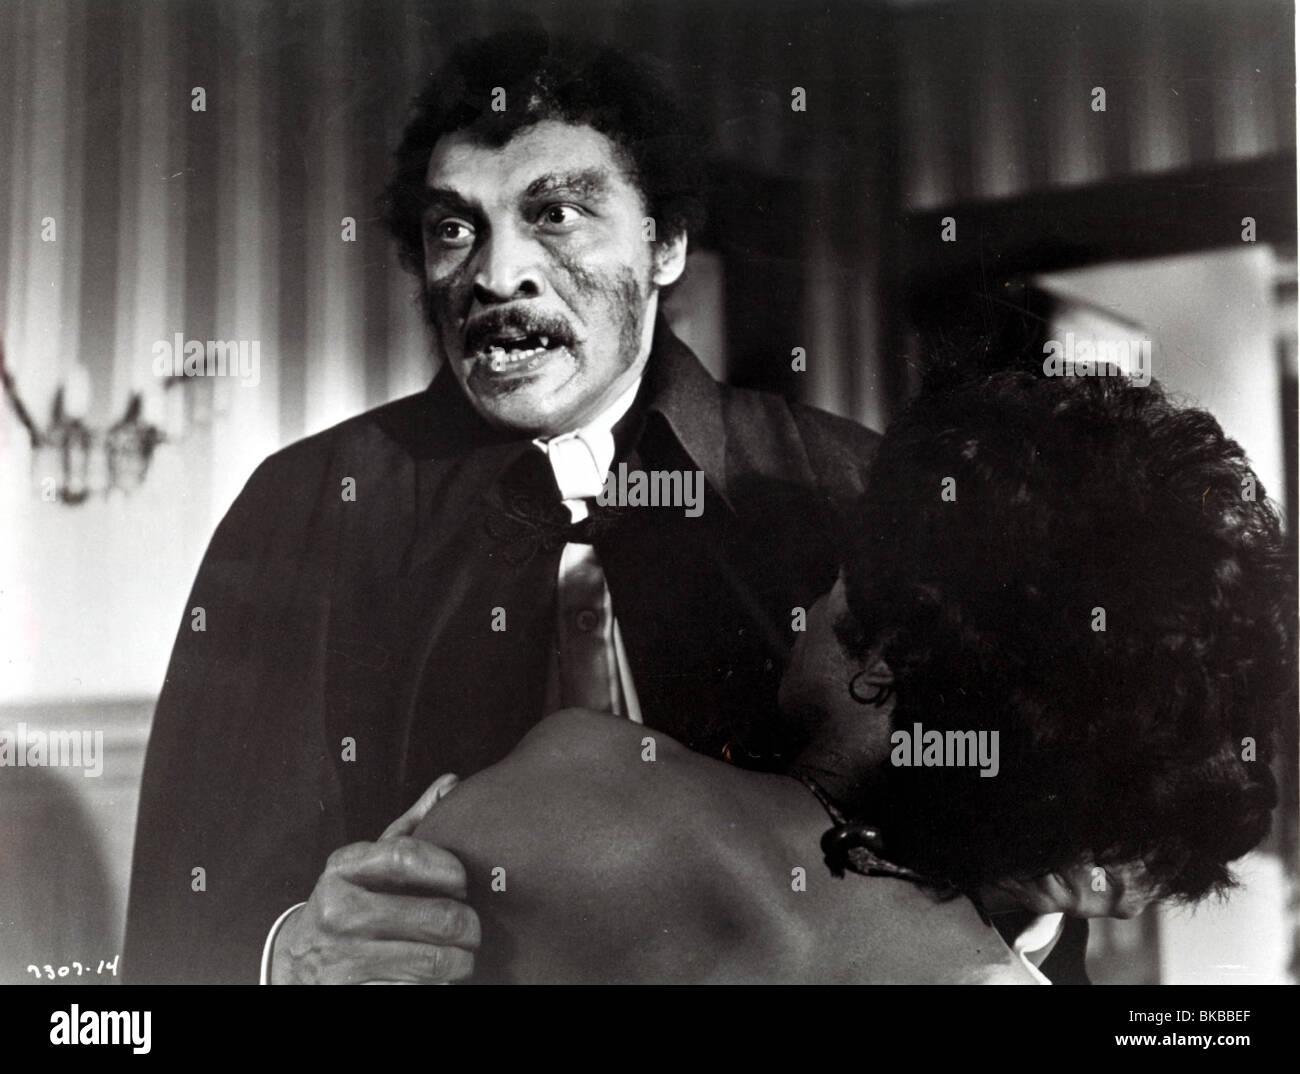 SCREAM, BLACULA, SCREAM (1973) WILLIAM MARSHALL SBS 001P - Stock Image